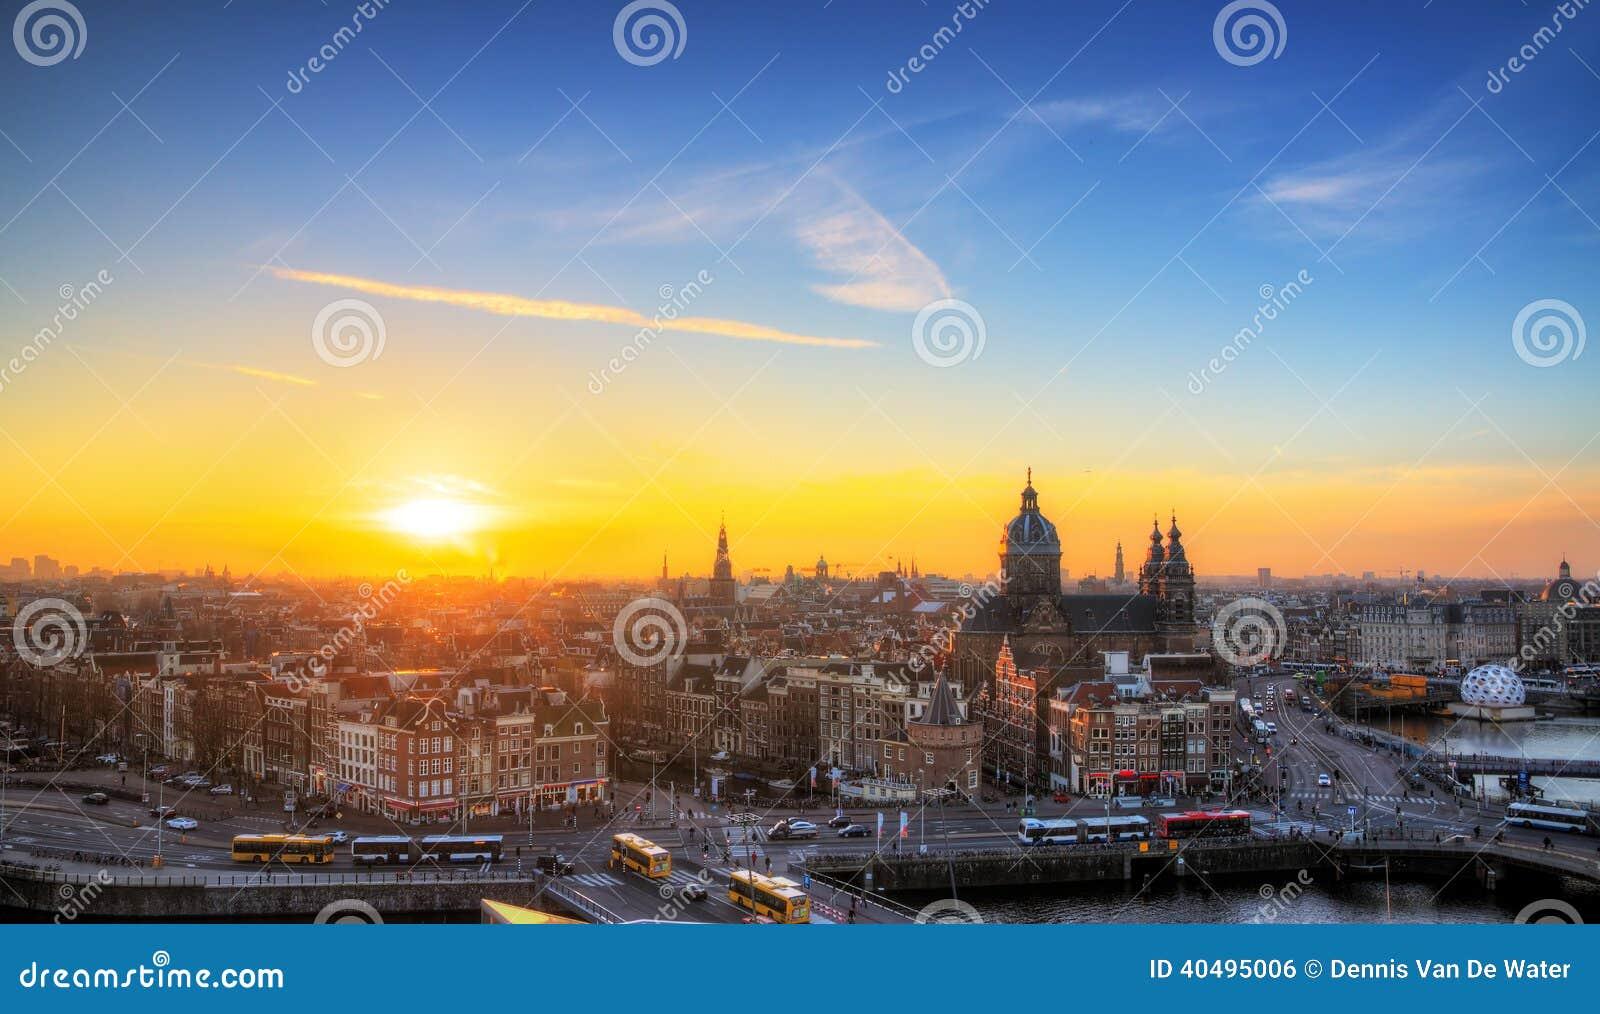 Amsterdam Sunset Skyline Stock Photo Image 40495006